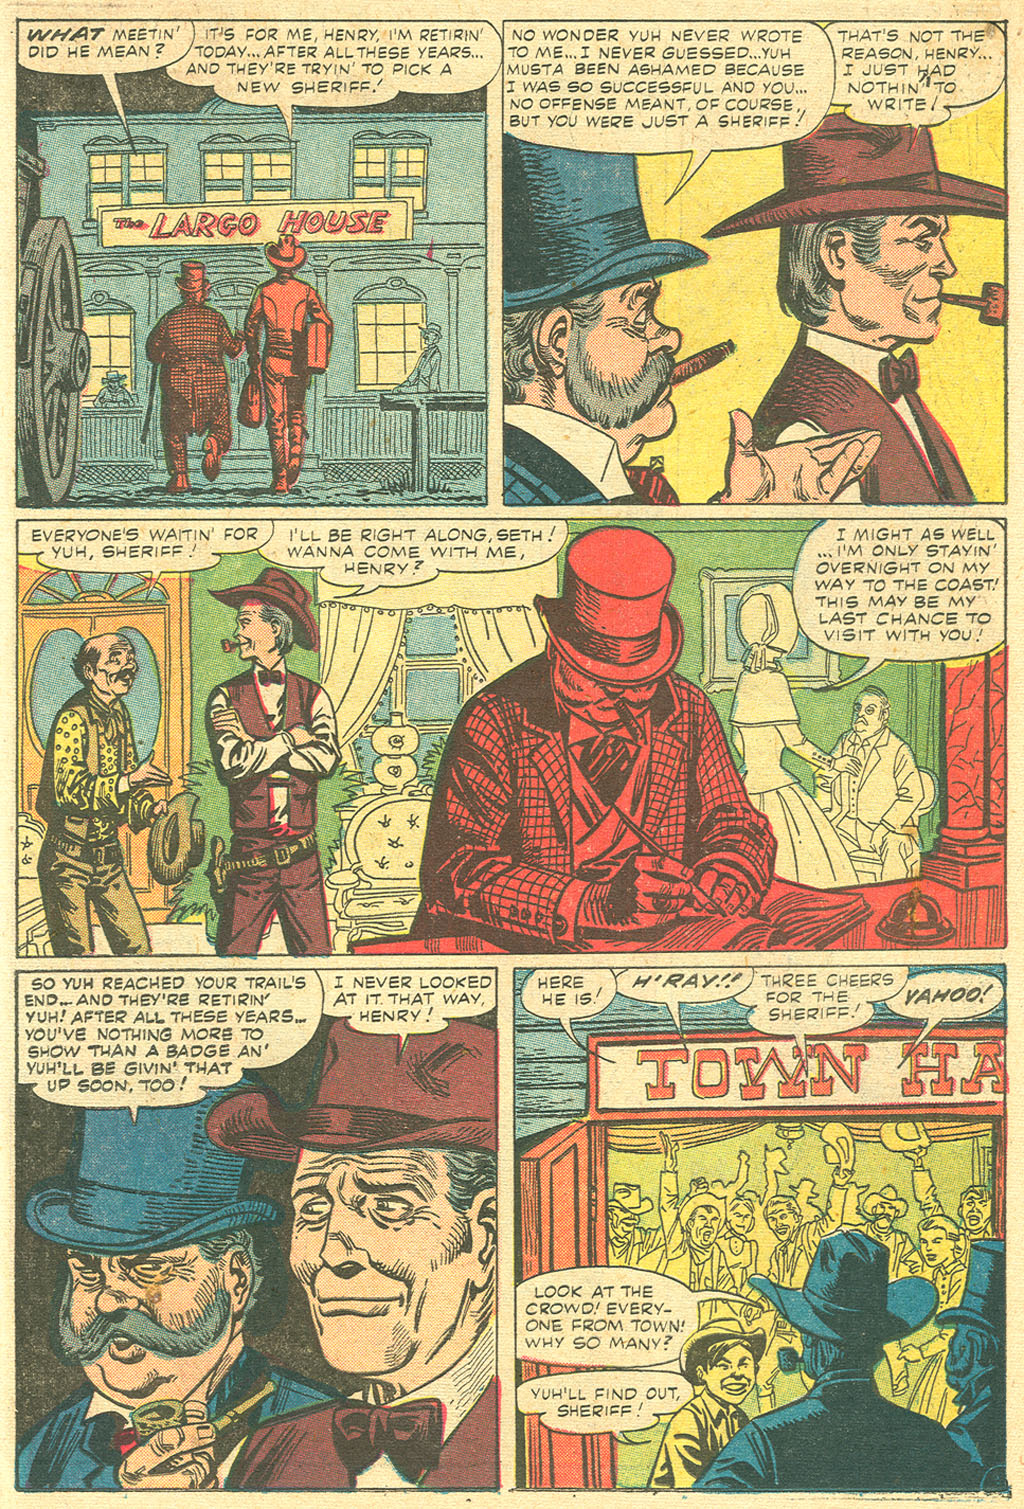 Read online Two-Gun Kid comic -  Issue #36 - 23